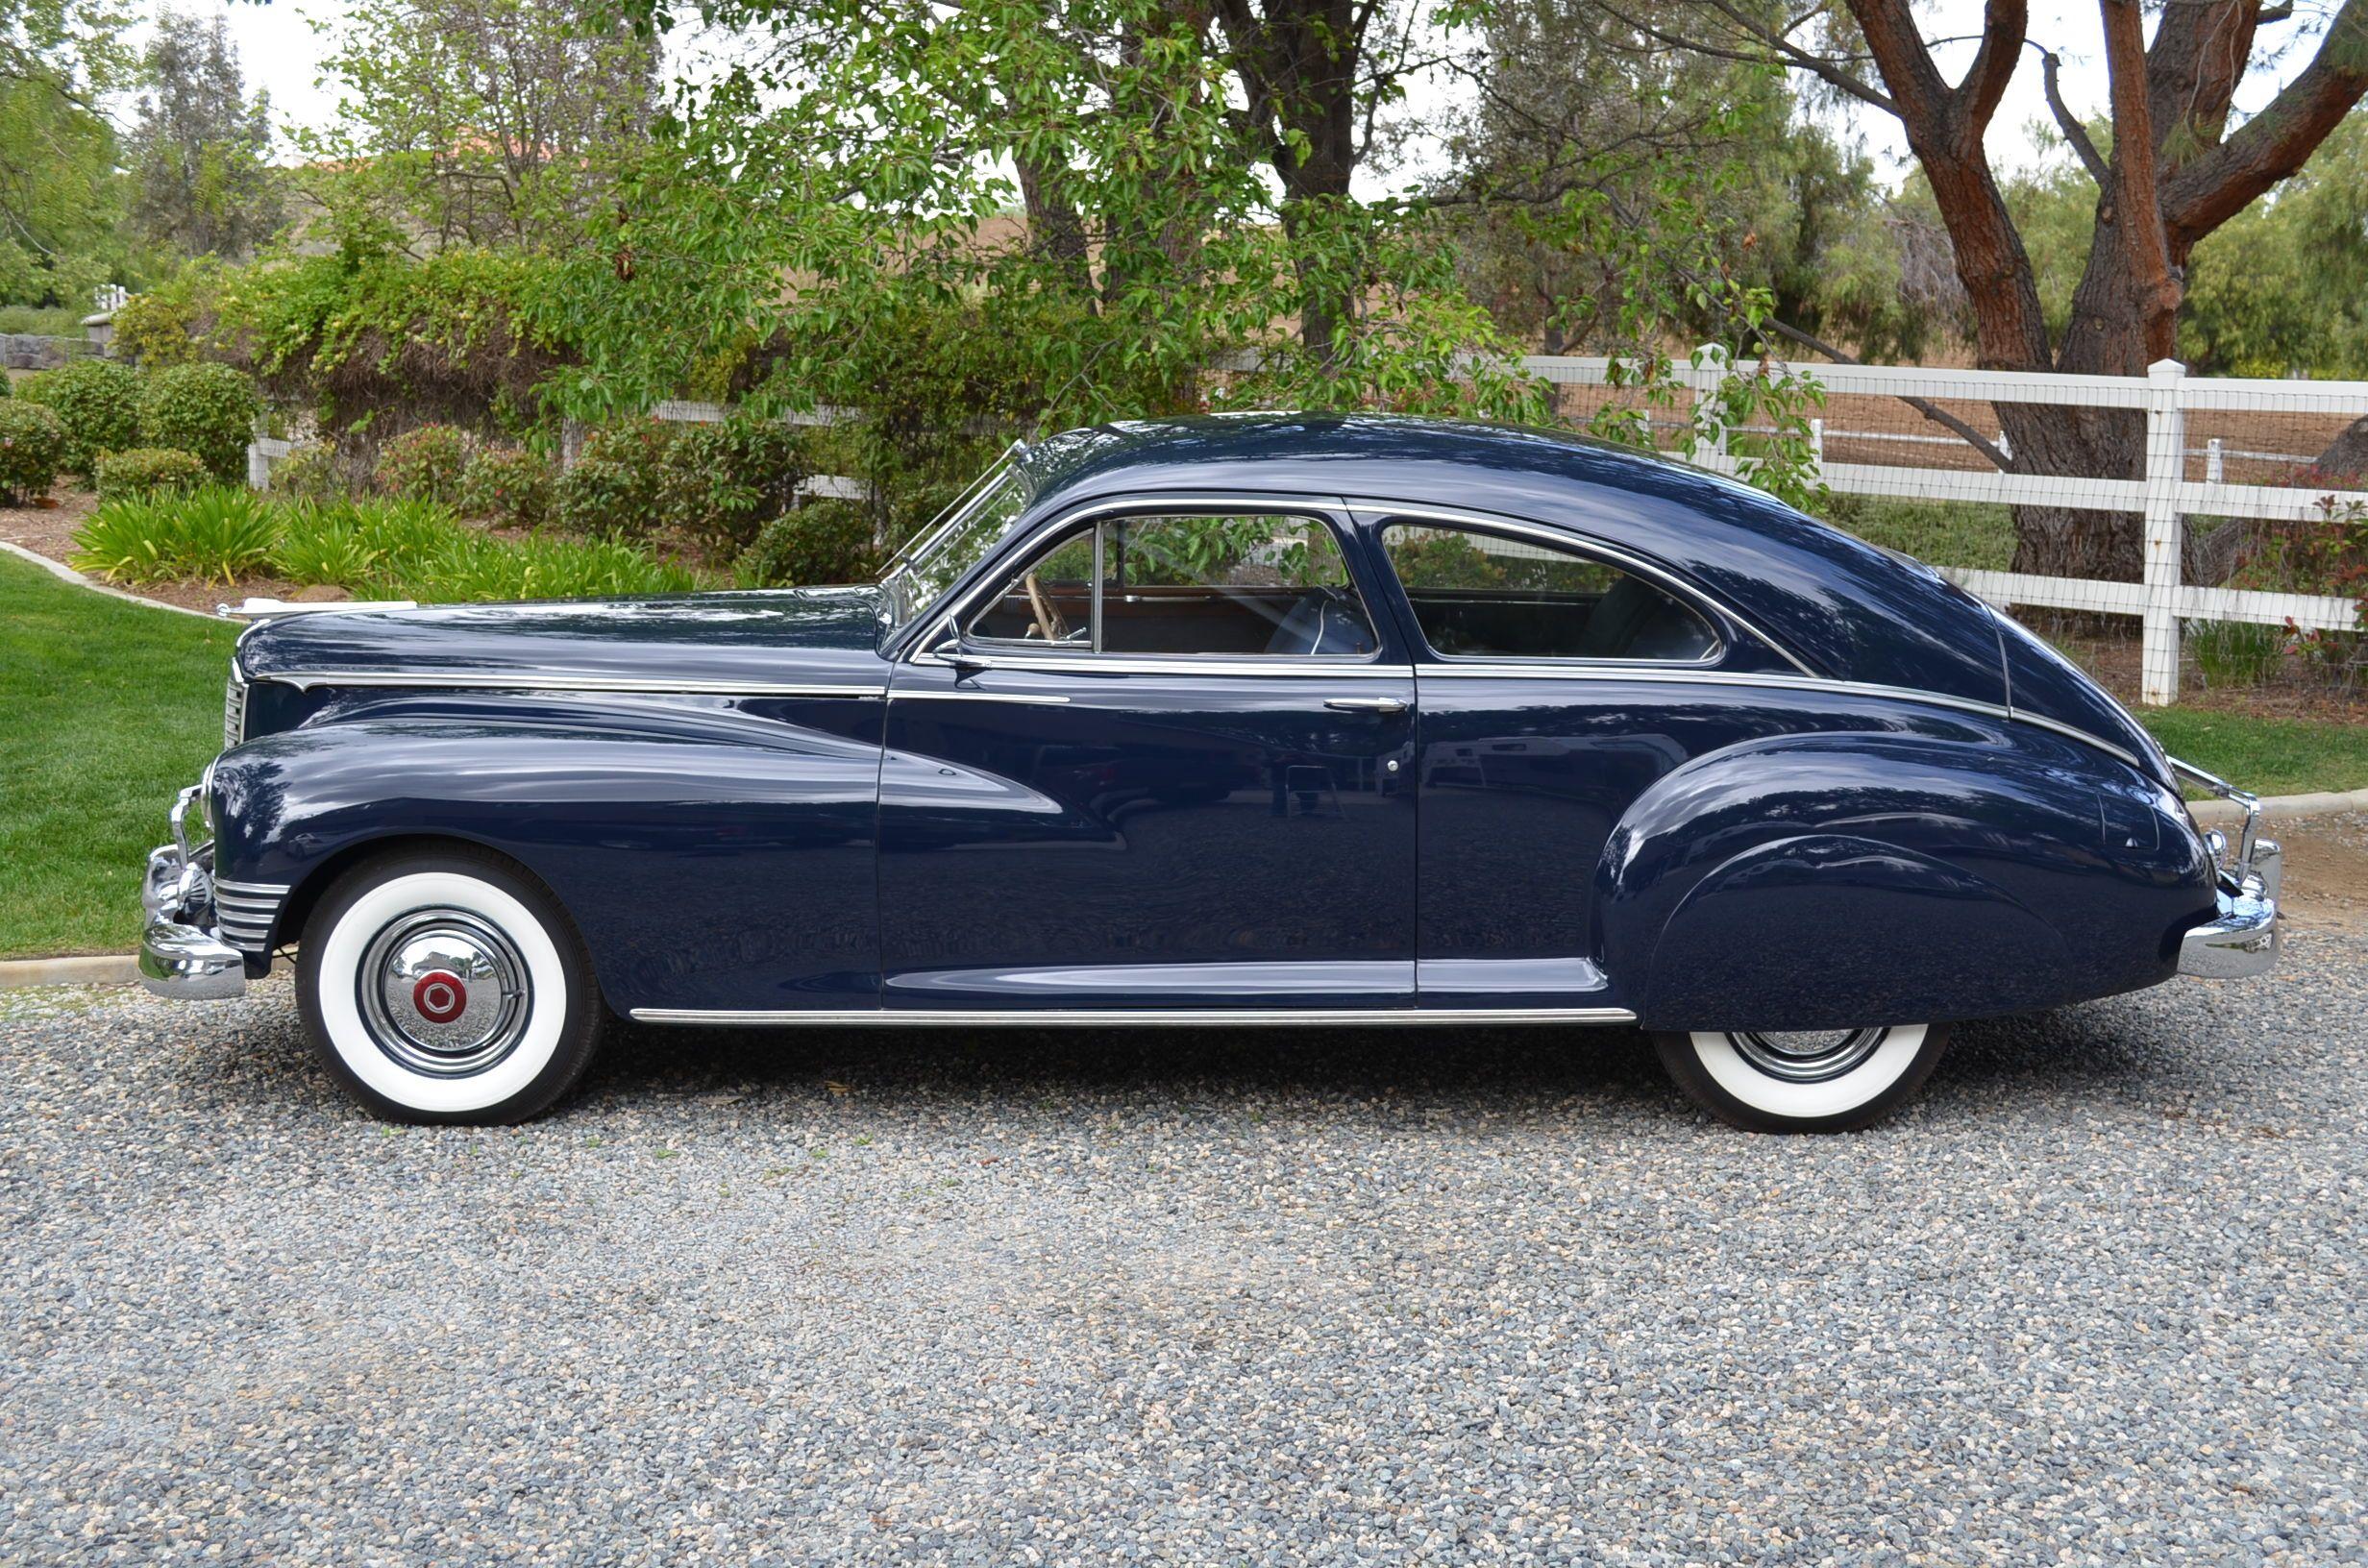 1947 Packard Custom Super Clipper Club Sedan Packard Cars Vintage Cars Classic Cars Vintage